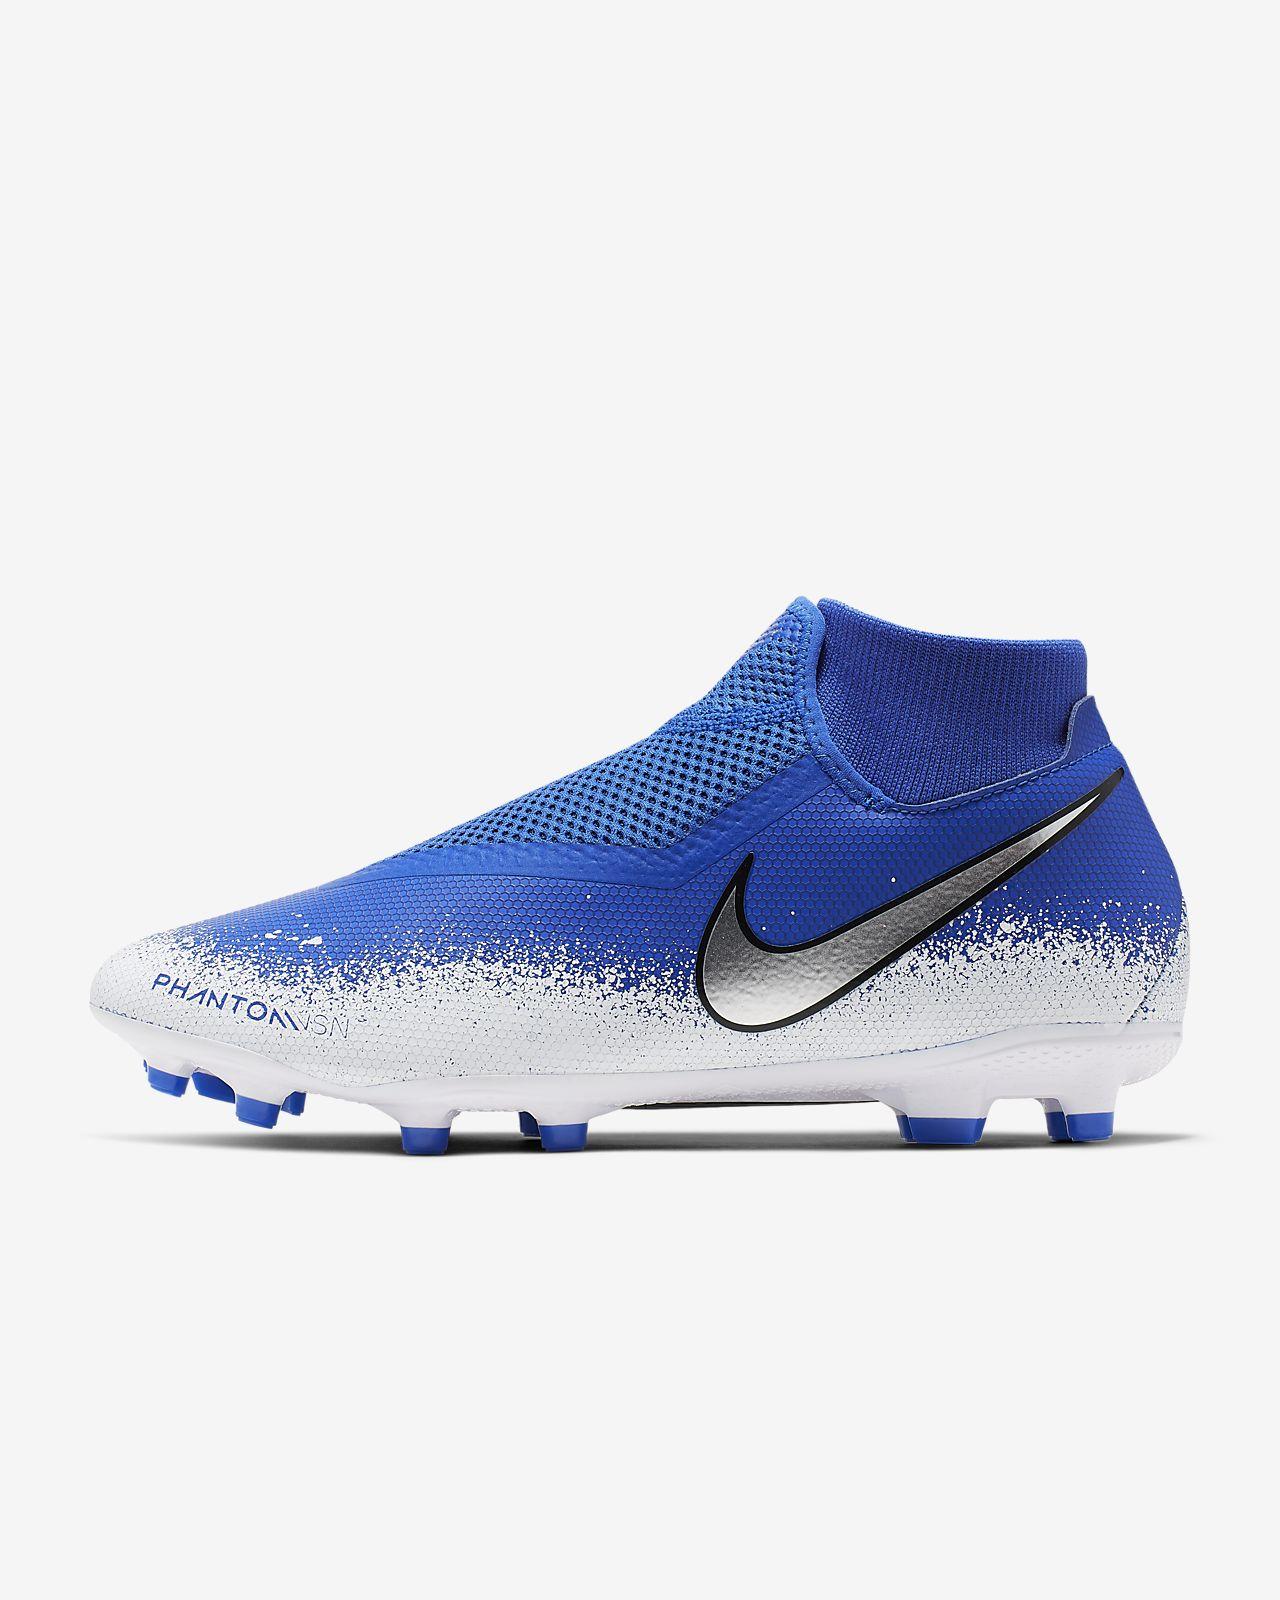 1fe5274710d ... Chaussure de football à crampons multi-surfaces Nike Phantom Vision  Academy Dynamic Fit MG